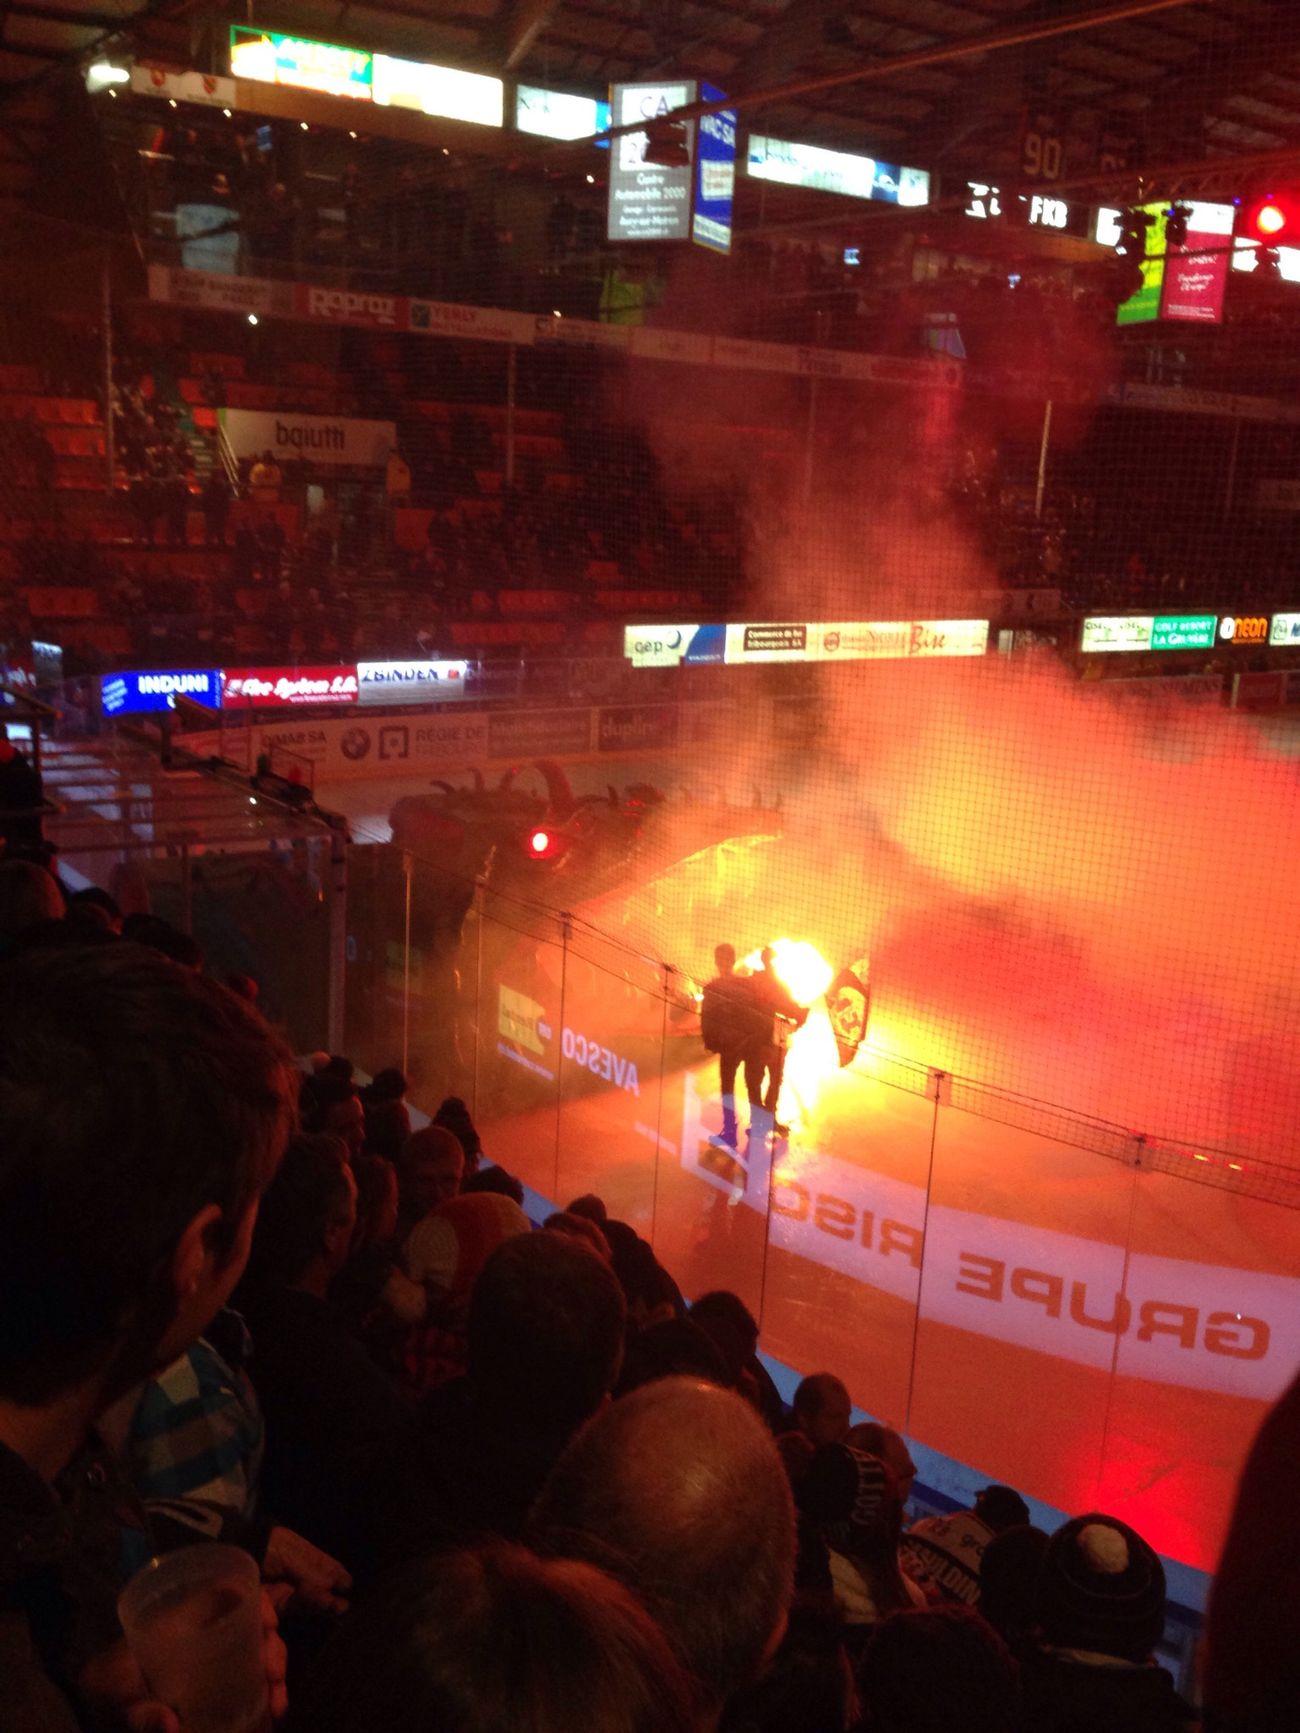 Dragon Fire Fribourg Gotteron❤️ Switzerland Icehockey Watching Ice Hockey Icehockey <3 Fribourg-Gotteron VS. EHC Biel (3:0)